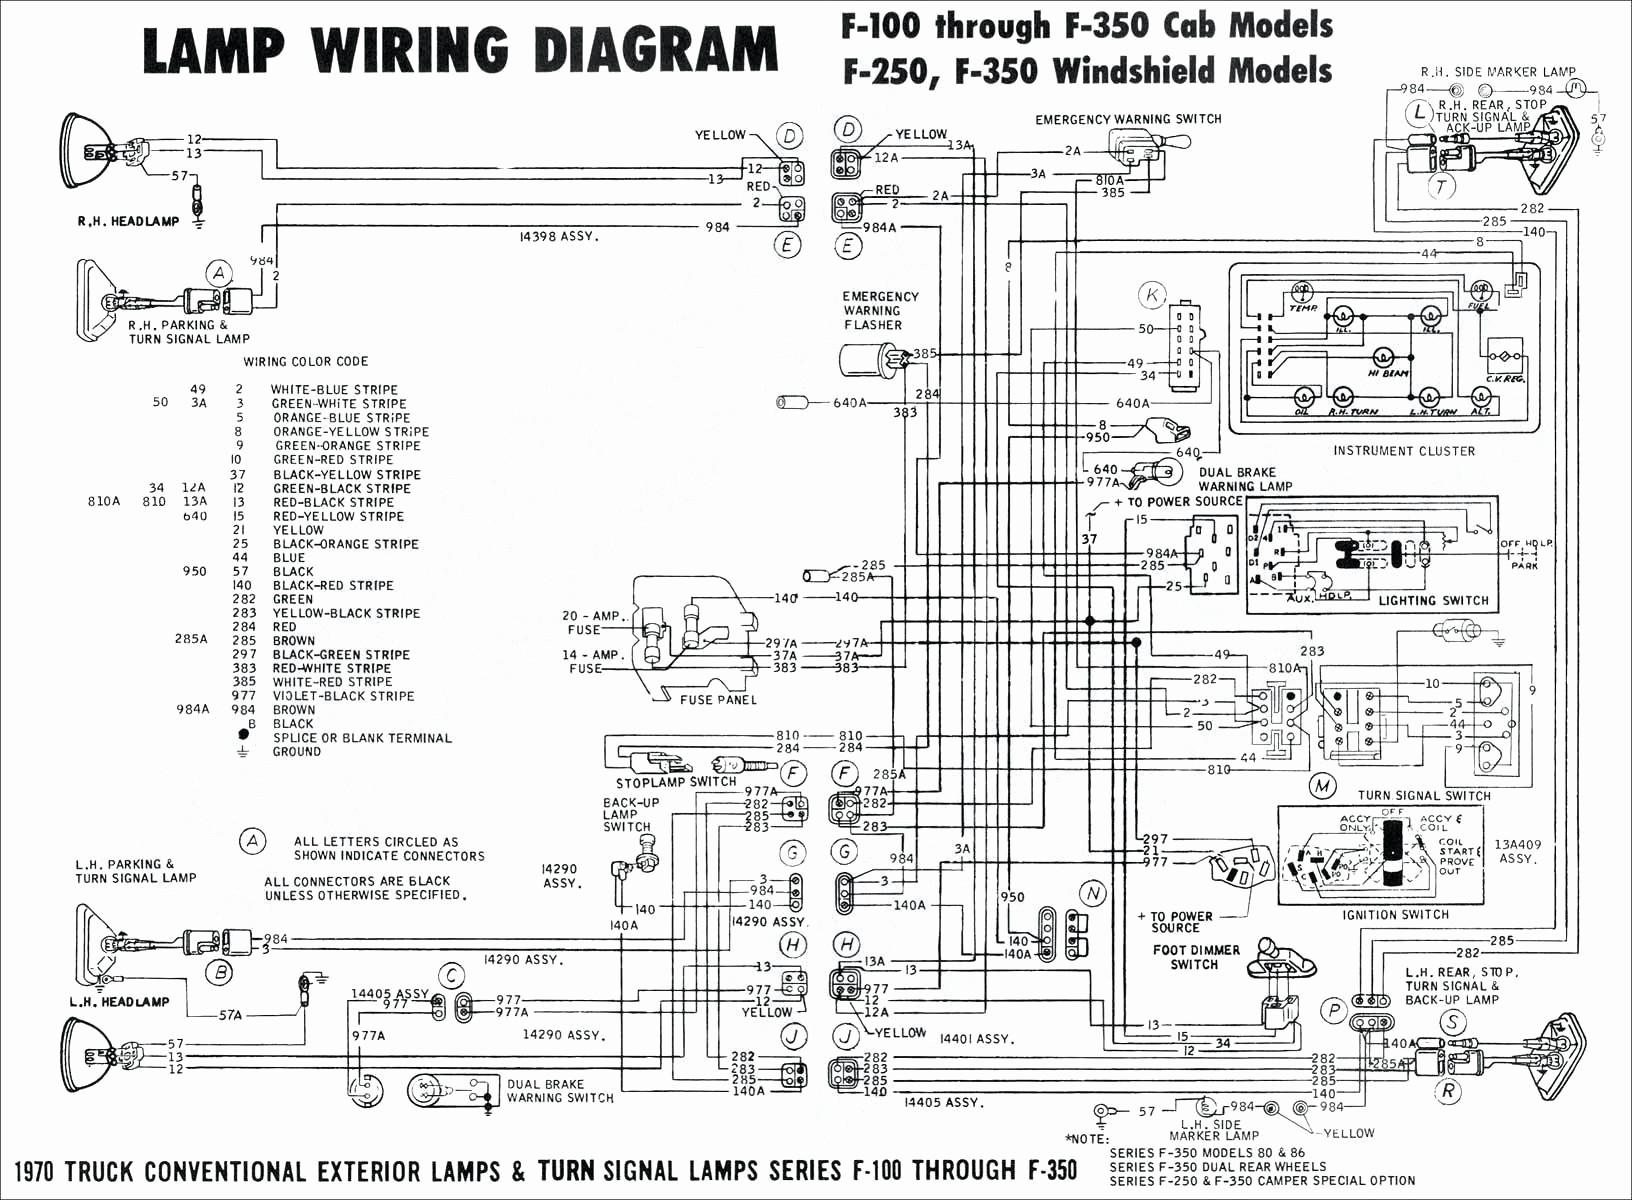 Duramax Wiring Schematic On 7 Wire Trailer Wiring Diagram With Kes